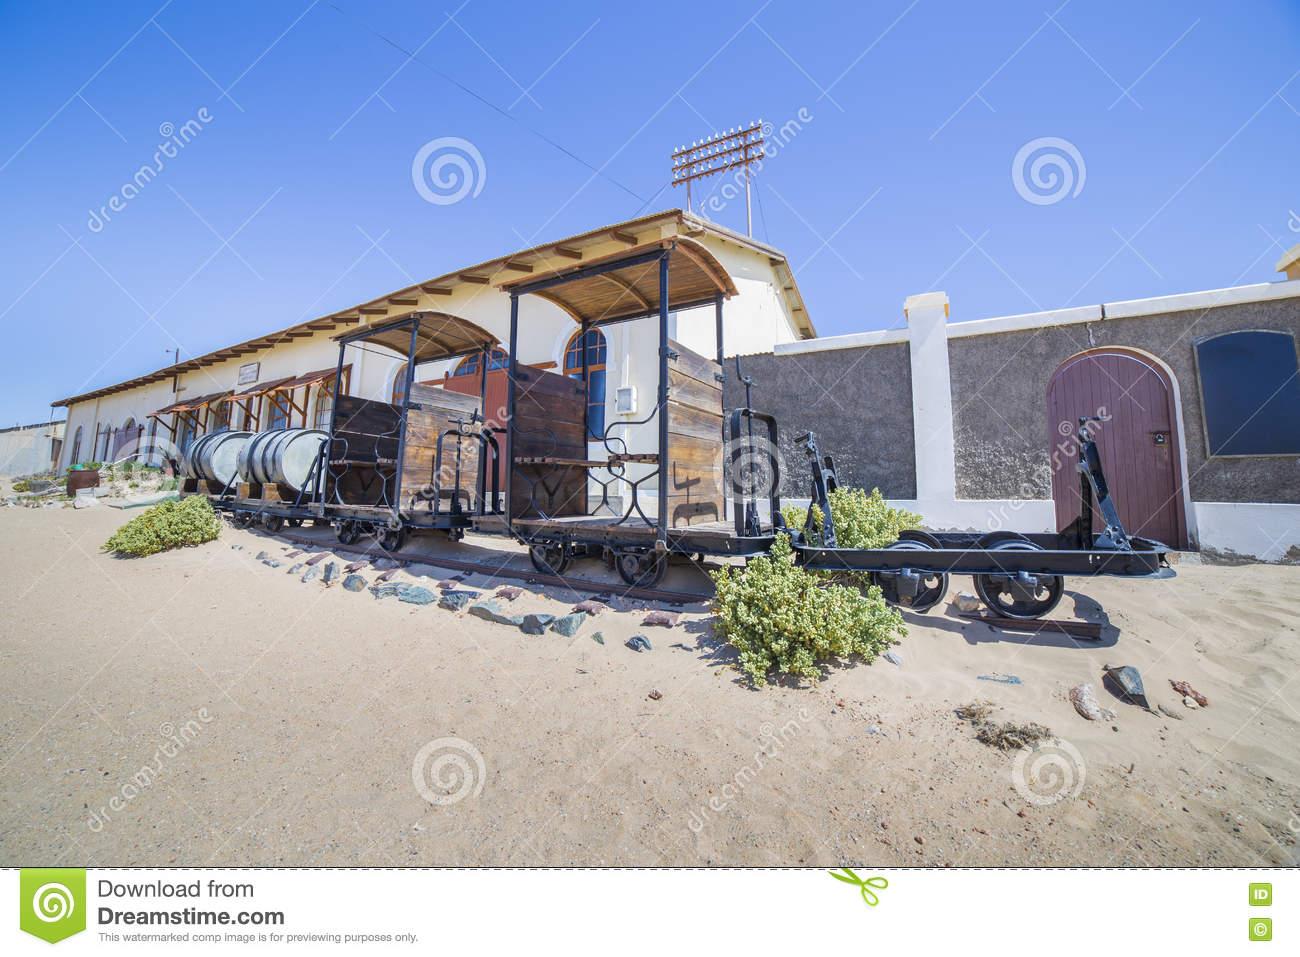 Abandoned Train In Kolmanskop, Namibia Stock Photo.